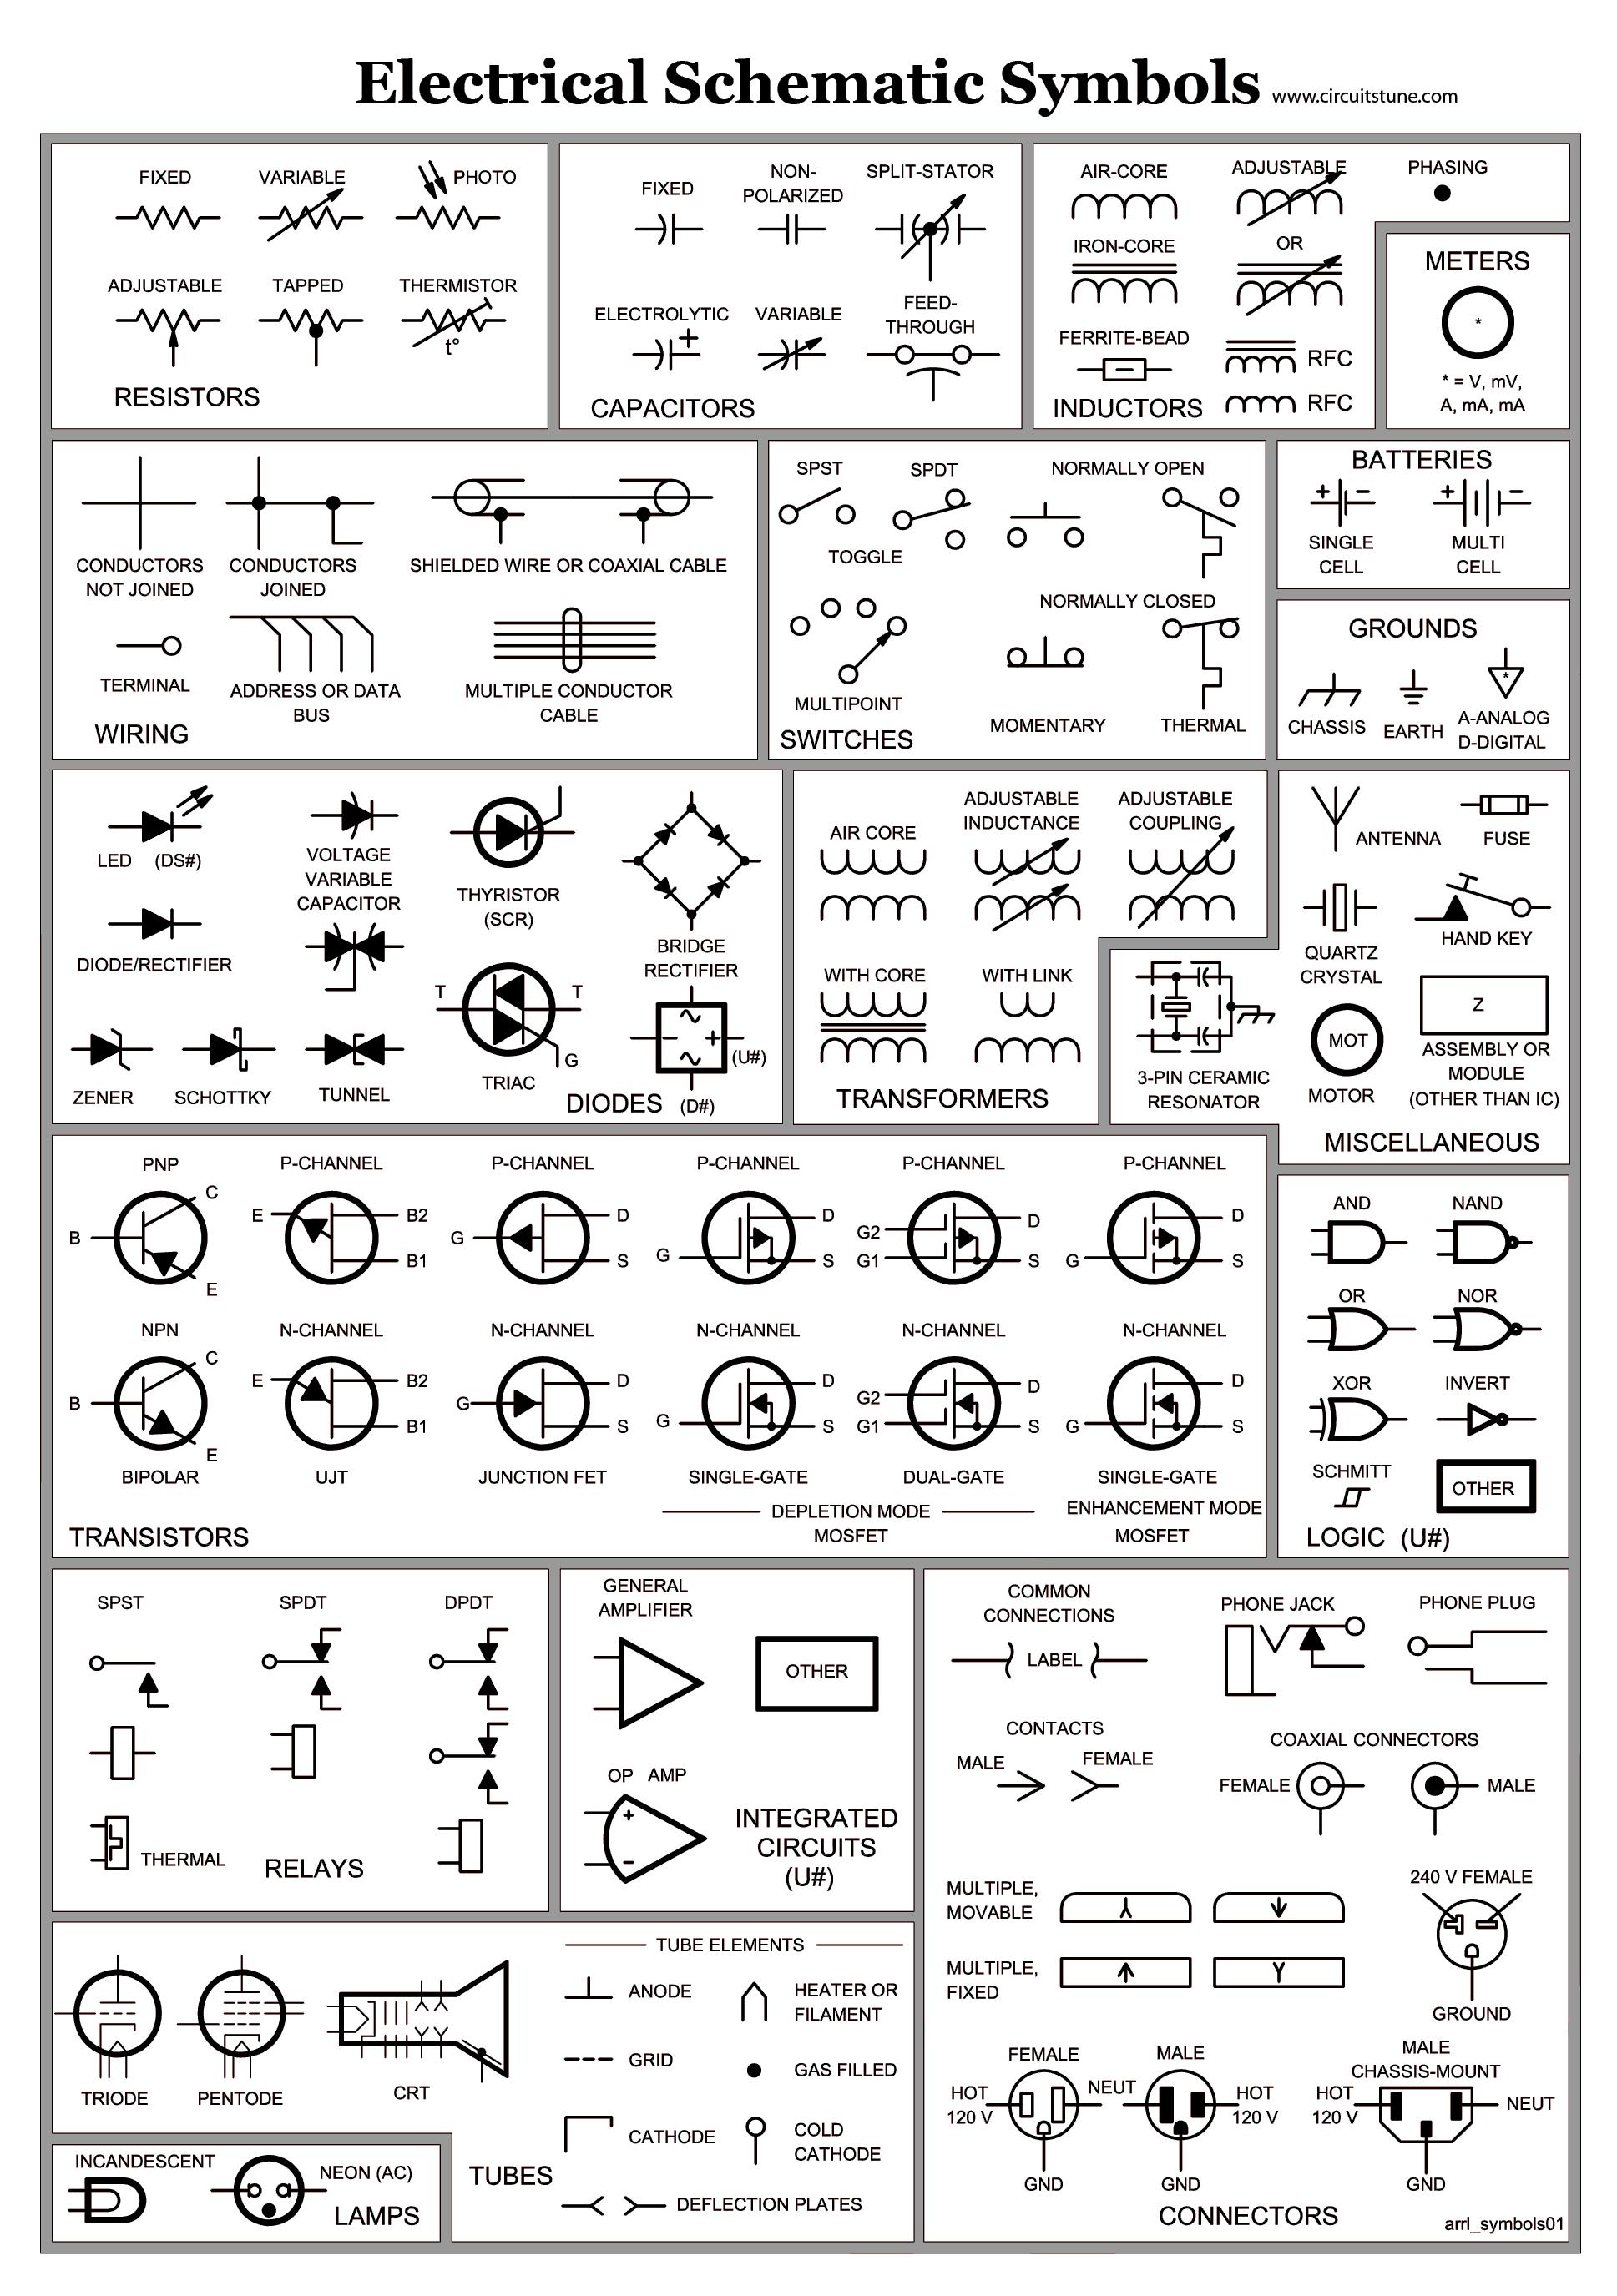 hvac electrical symbols chart - Crian | Hvac Electrical Wiring Diagram Symbols |  | Crian